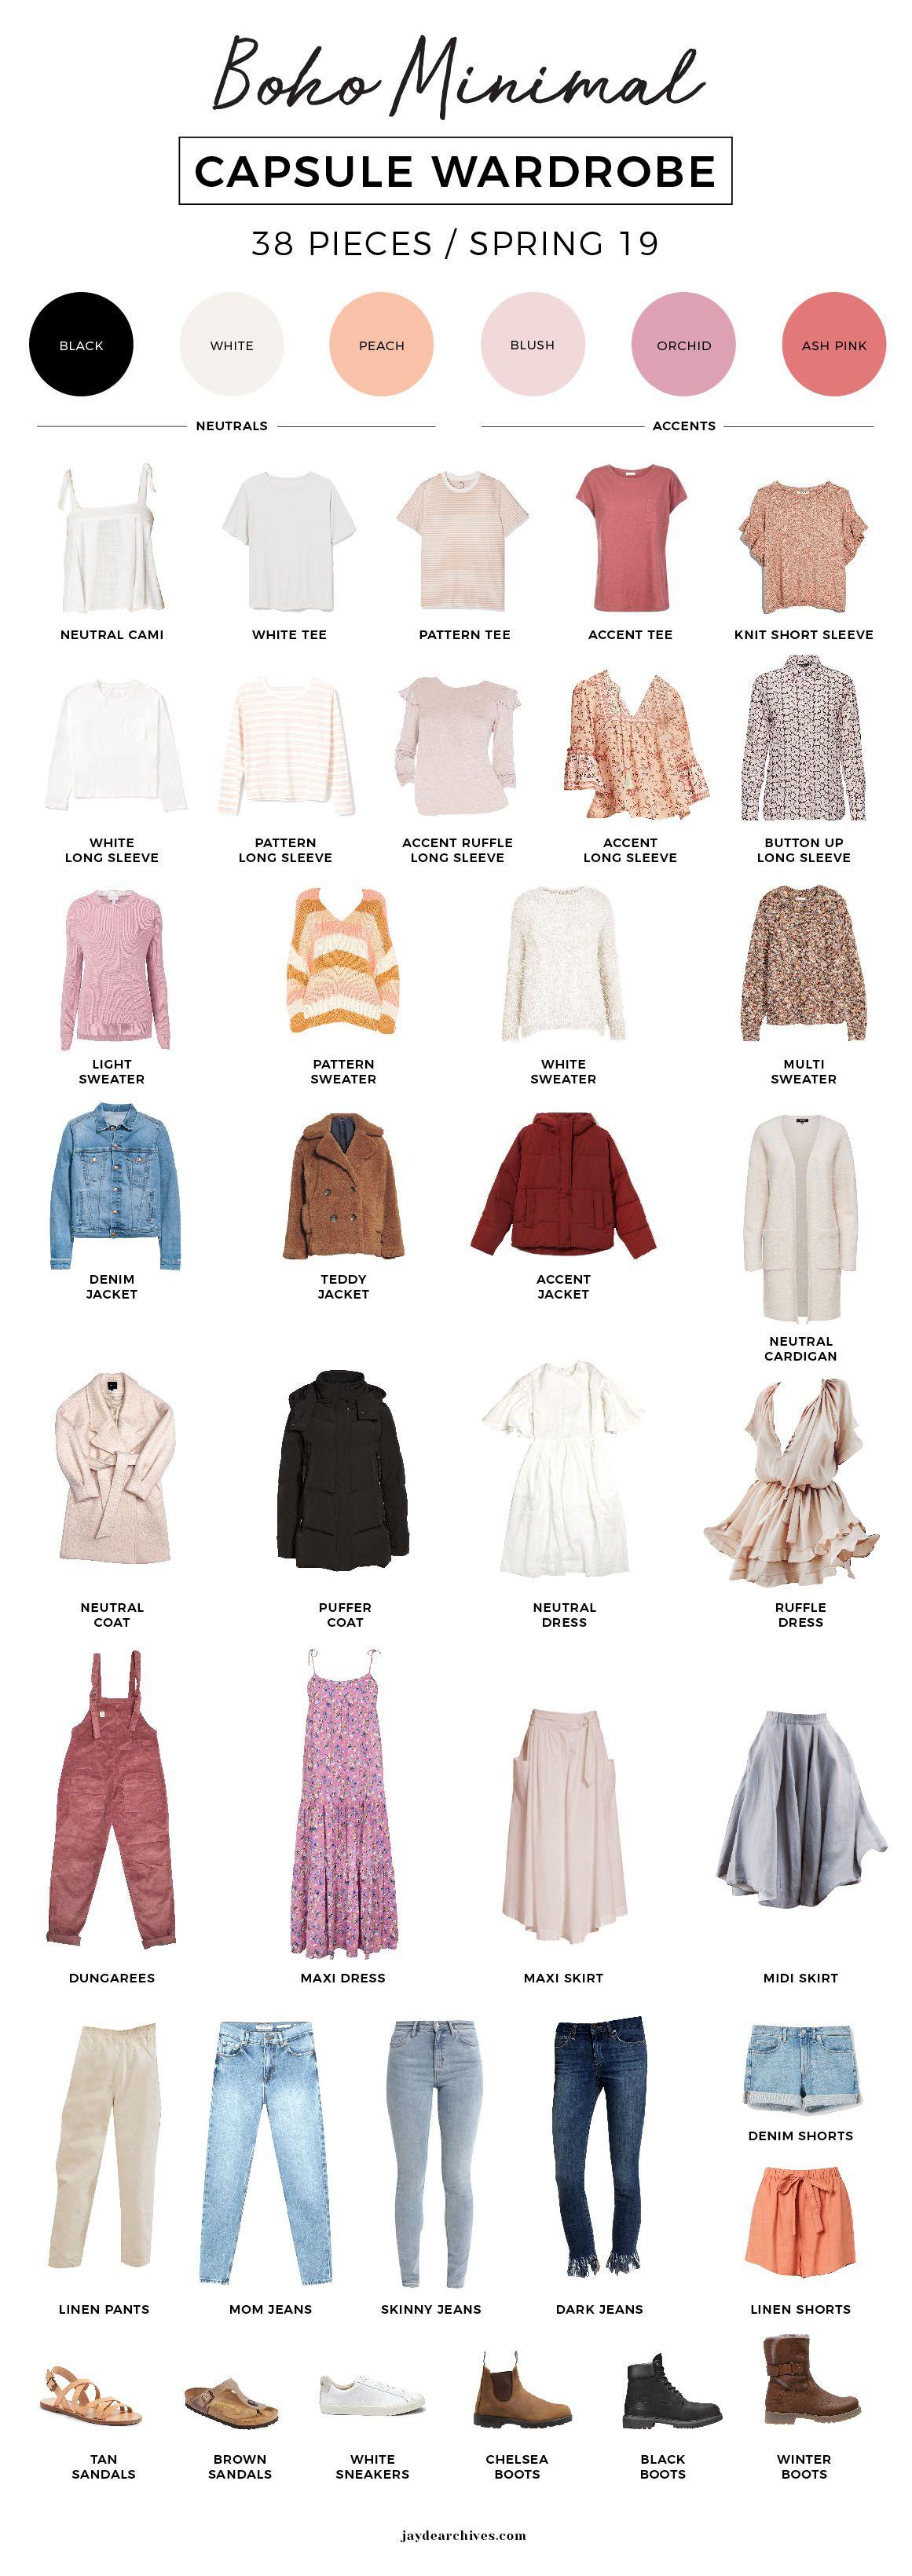 My 19′ Boho Minimal Spring Capsule Wardrobe #summerwardrobe